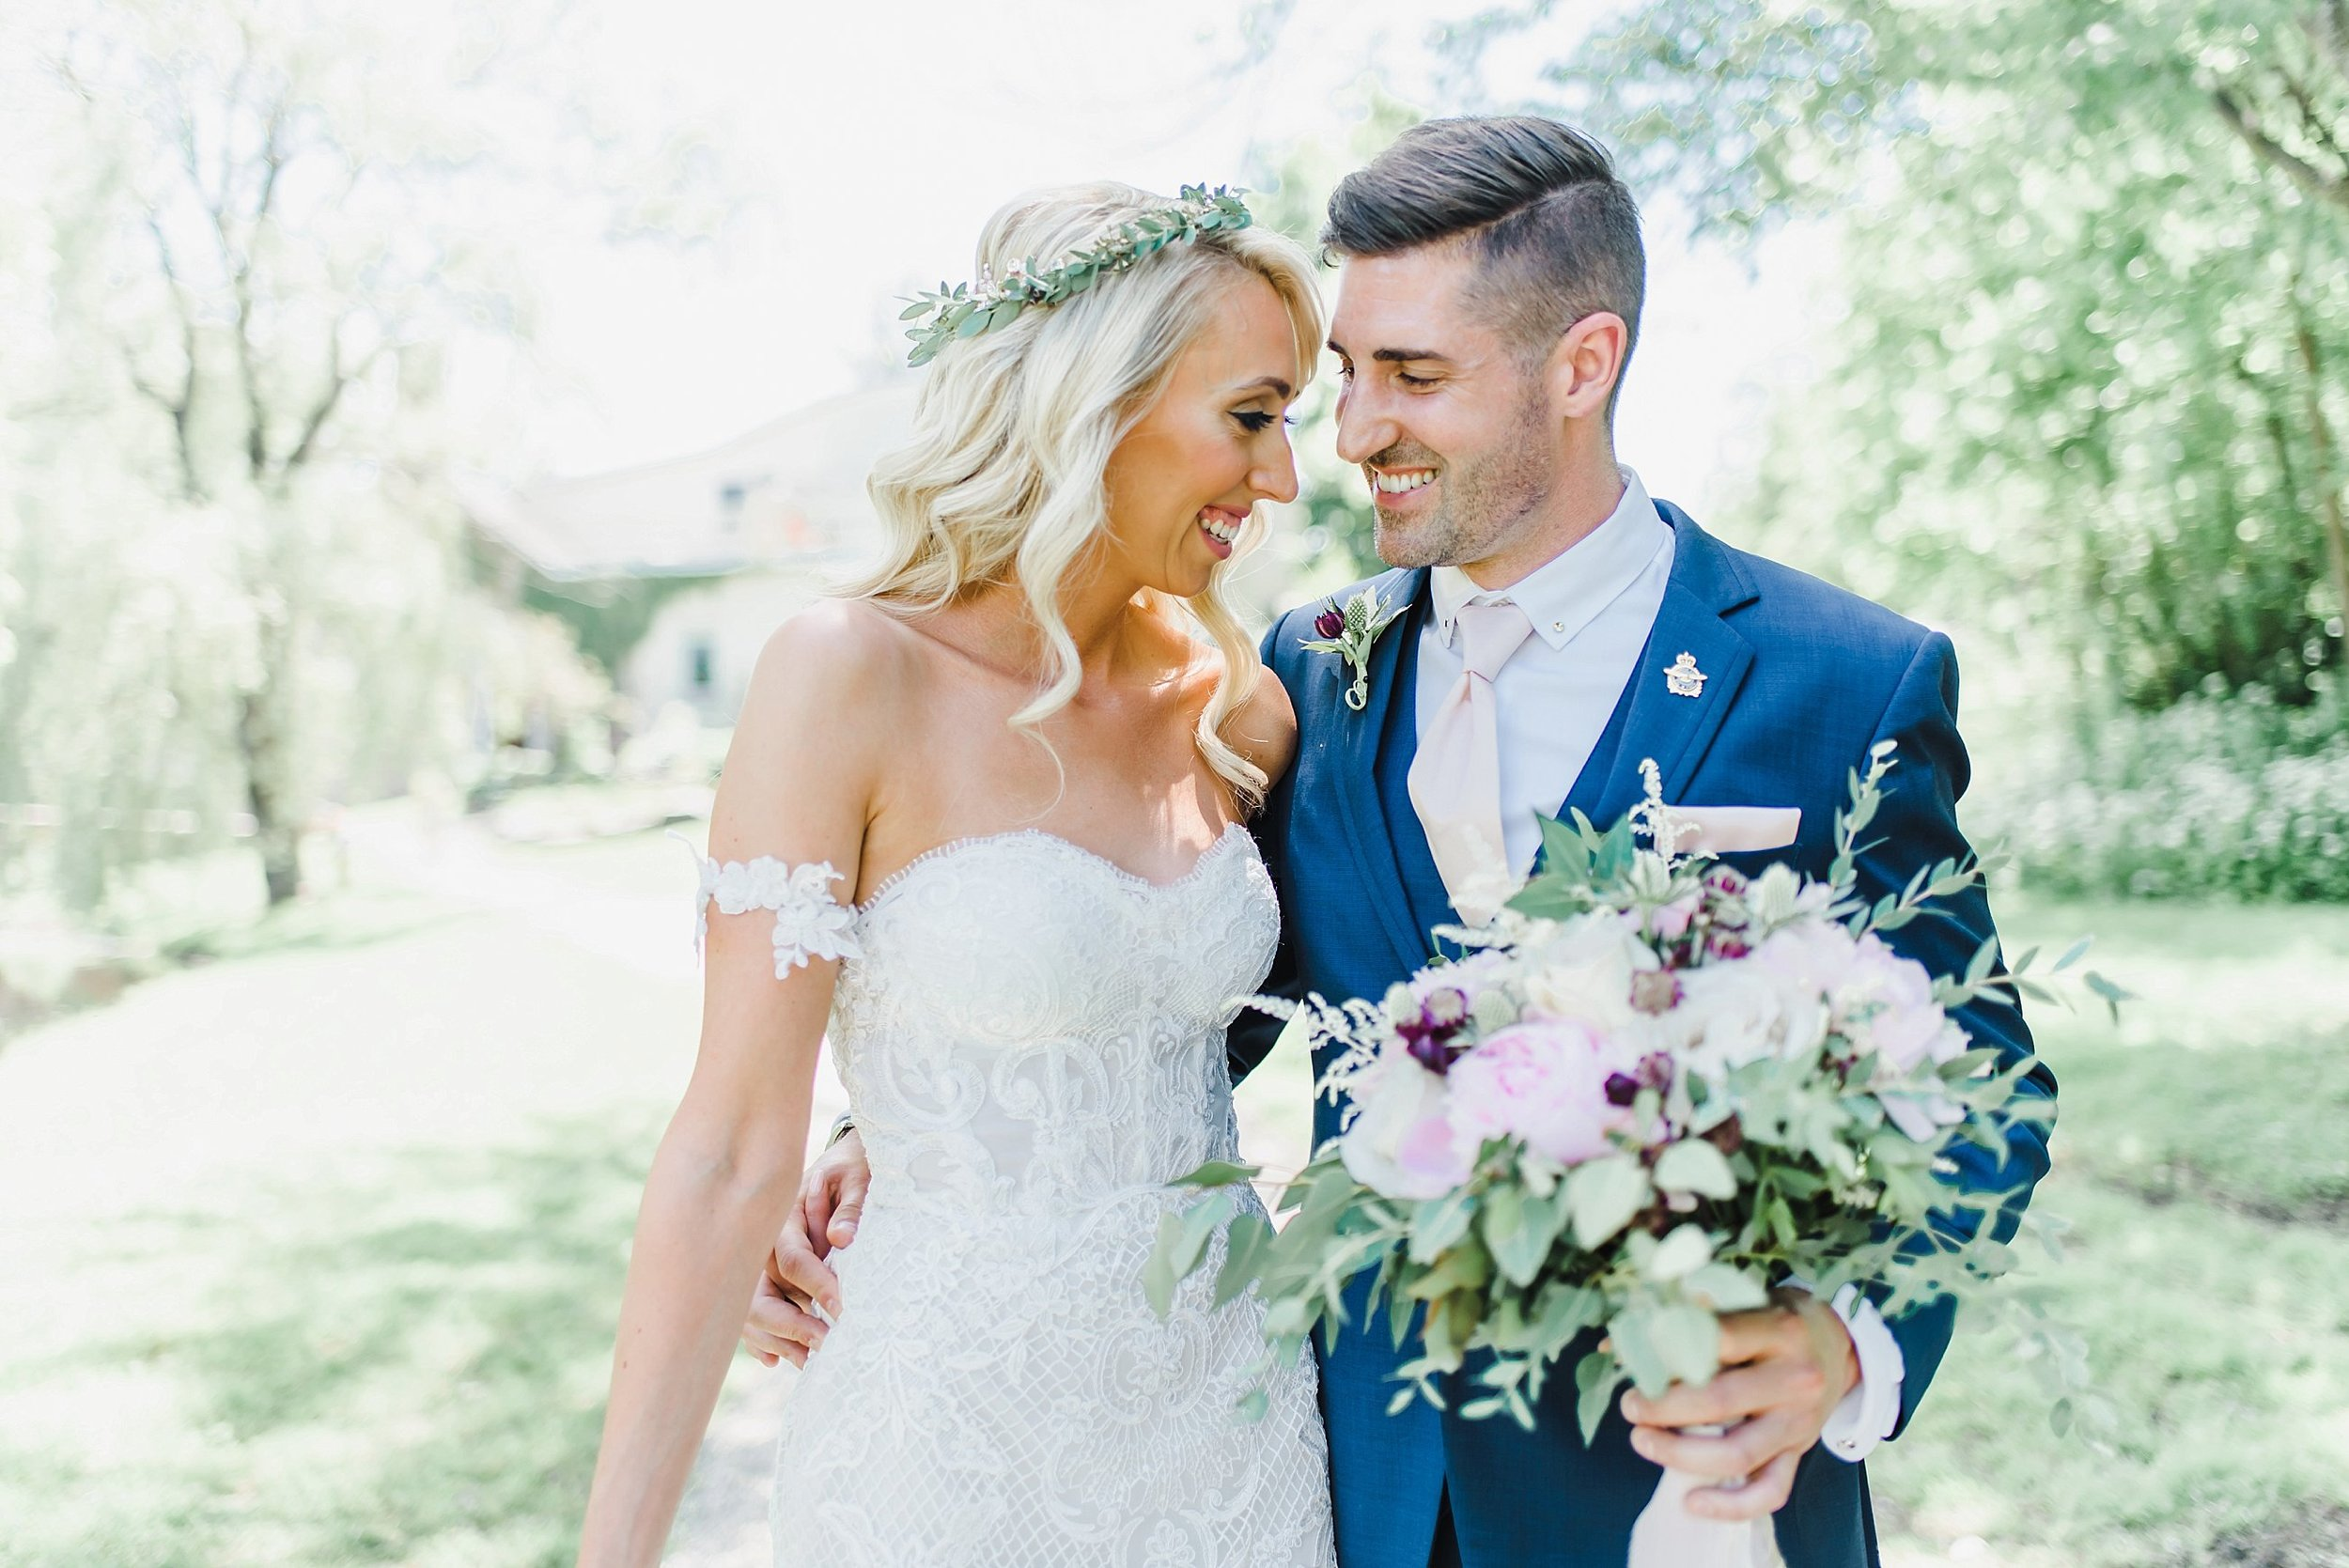 light airy indie fine art ottawa wedding photographer | Ali and Batoul Photography_0040.jpg